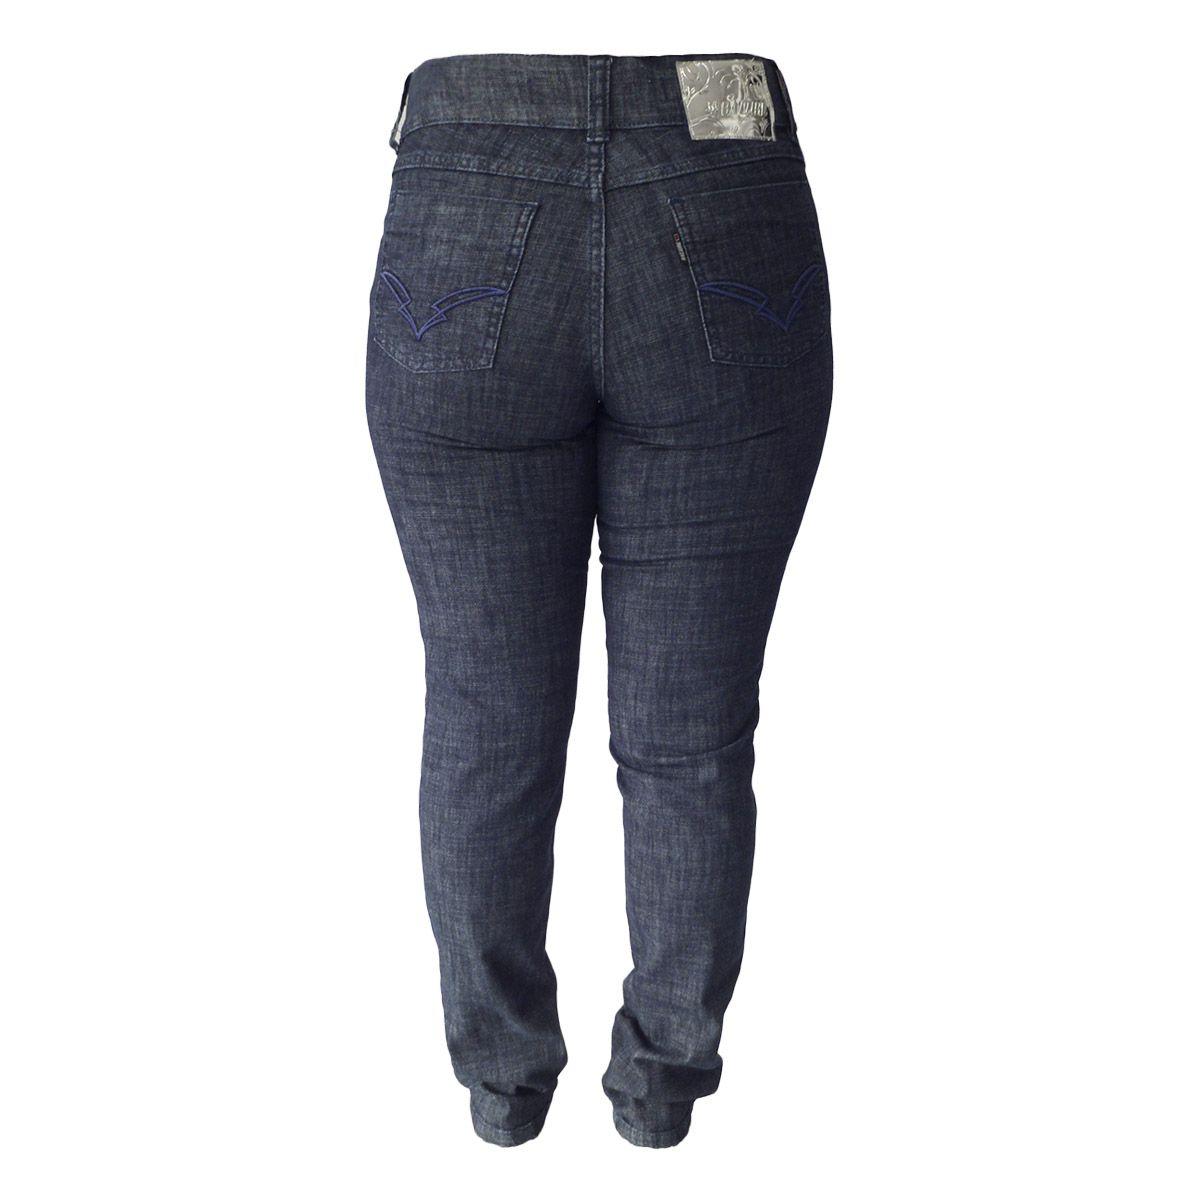 Calça Jeans Hot Pants Cint. Alta Plus Size Tamanhos 38 Ao 48